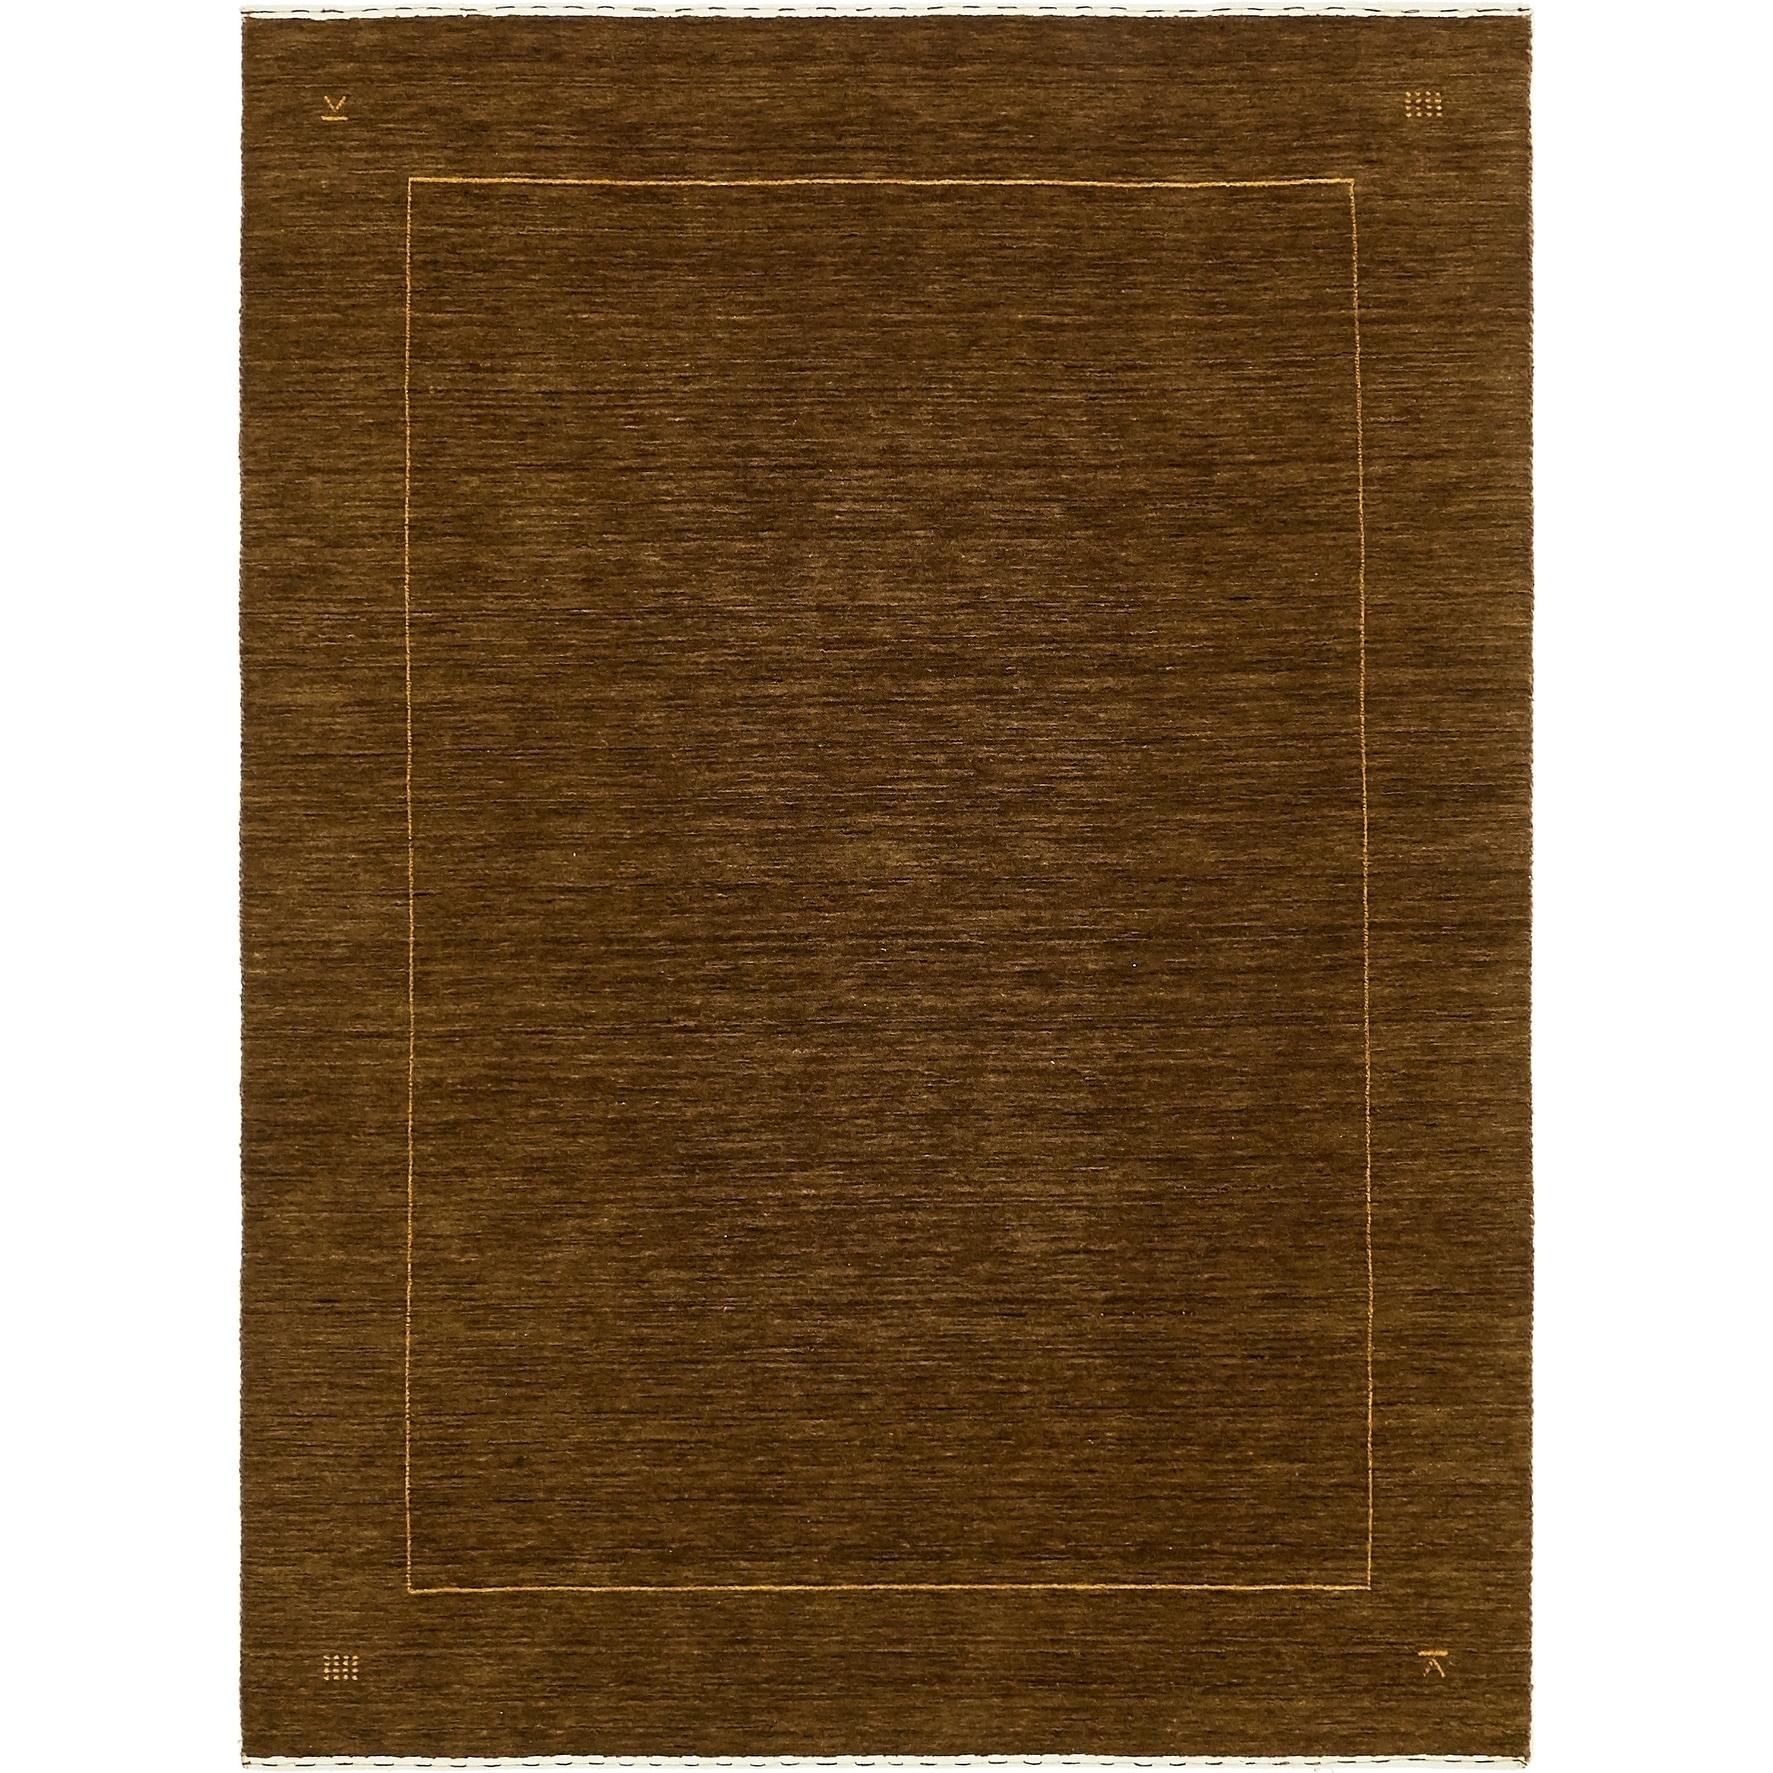 Hand Knotted Kashkuli Gabbeh Wool Area Rug - 4 10 x 6 8 (Olive - 4 10 x 6 8)